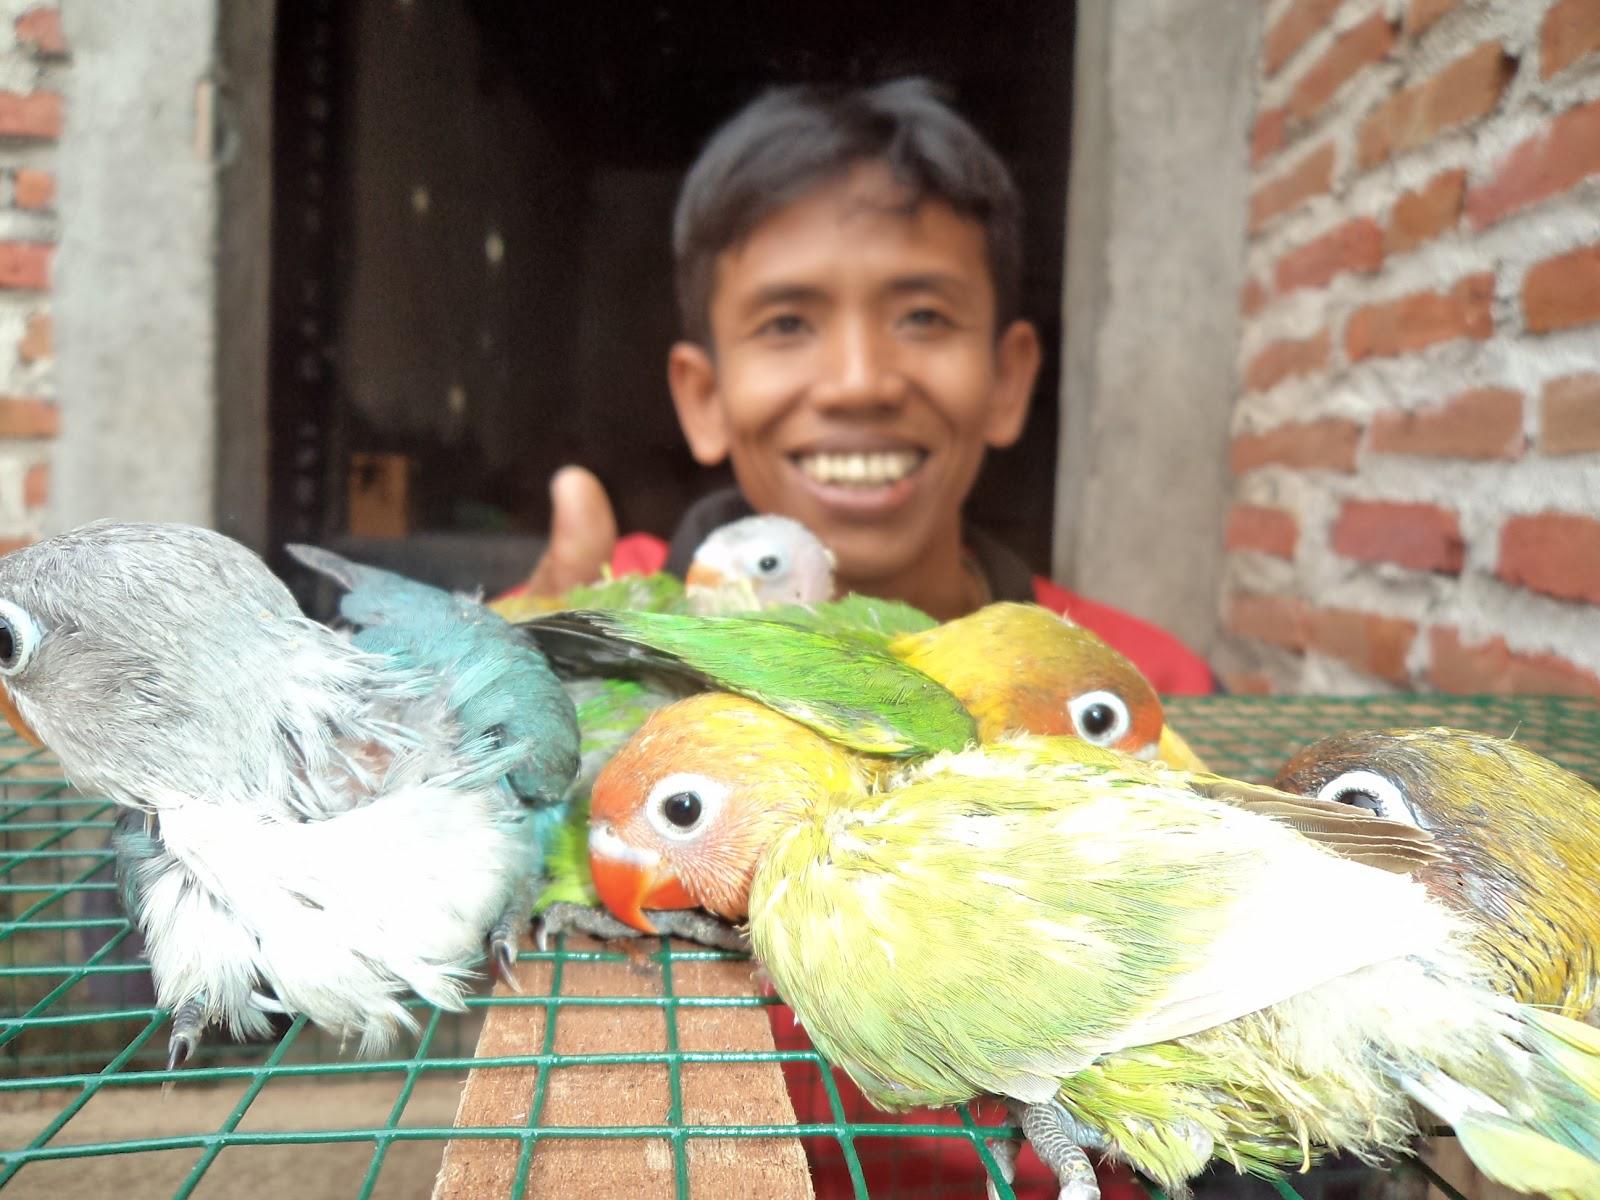 Daftar Harga Lovebird Tahun 2013di Jawa  Menjual Semua Jenis Burung Love Bird Burung Love Bird